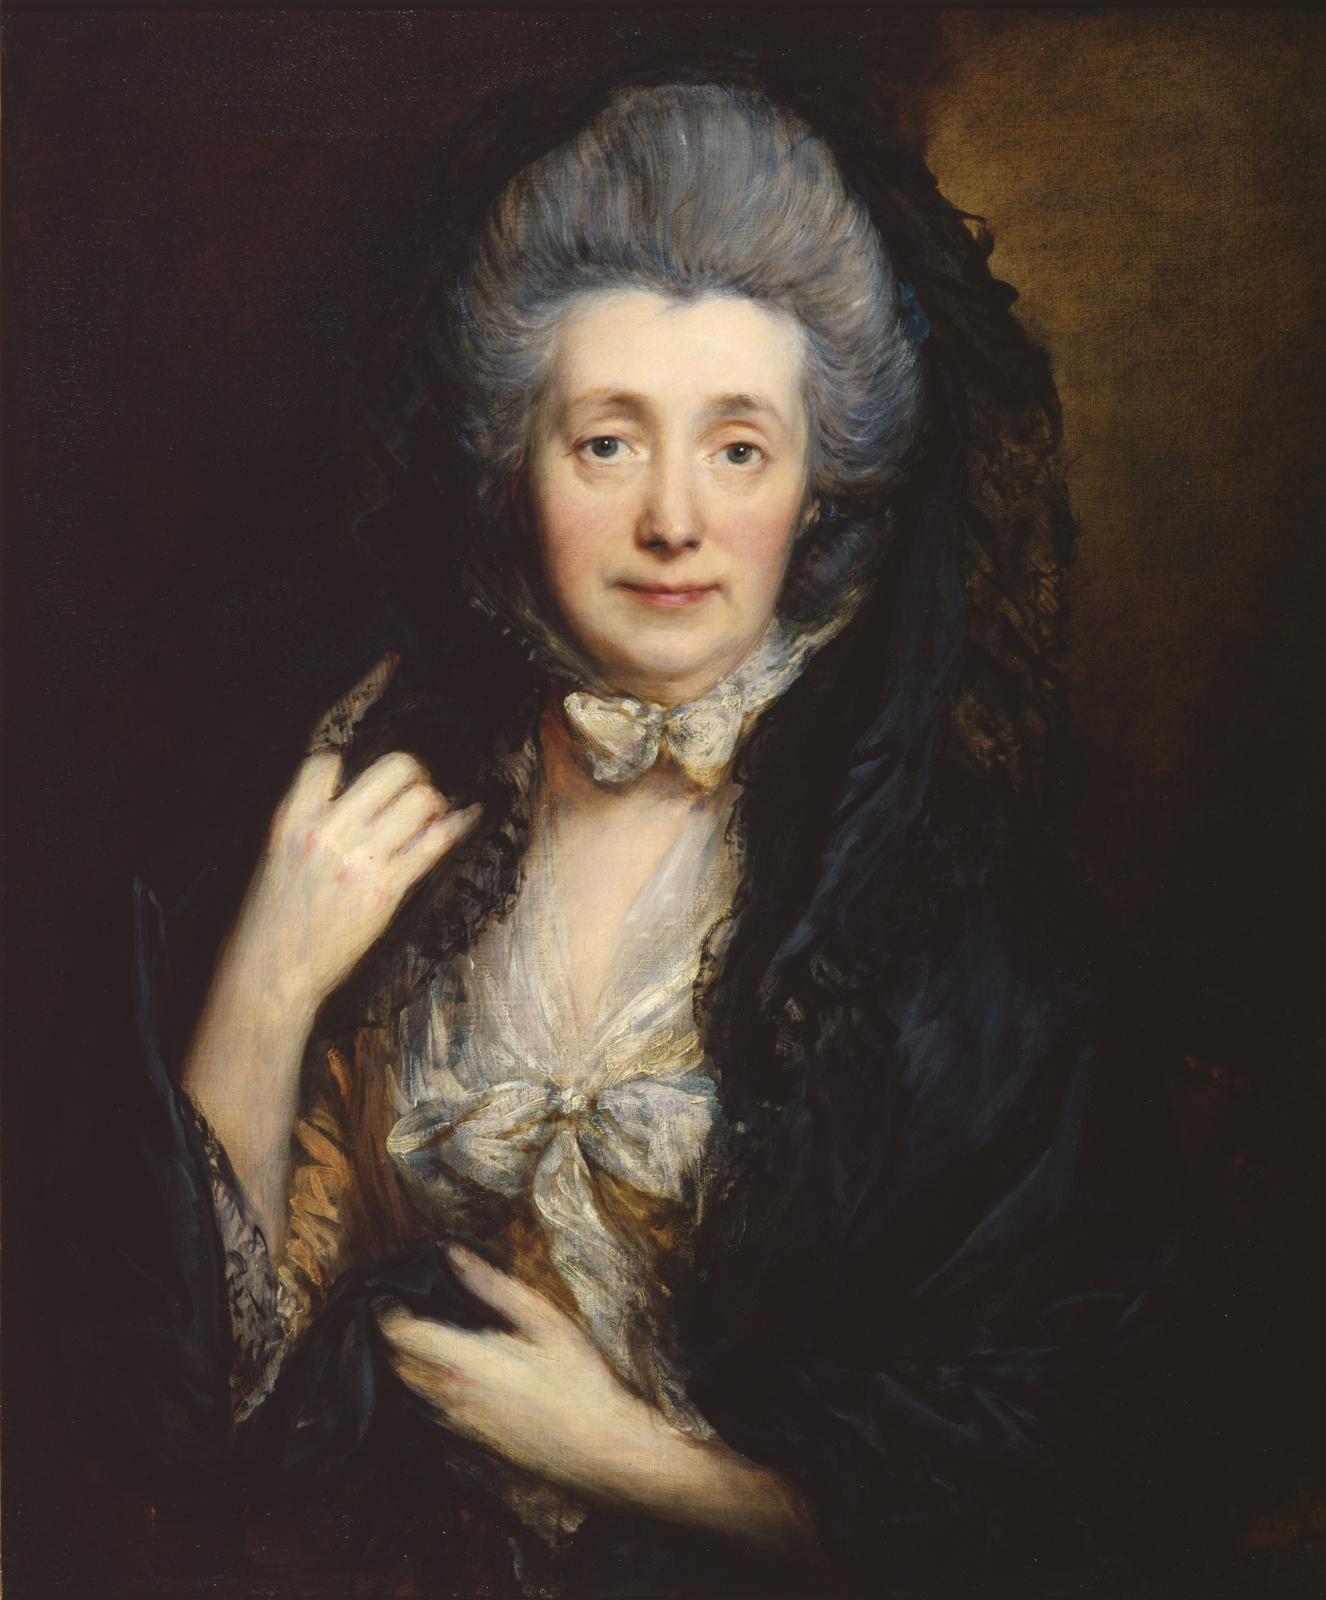 Thomas Gainsborough(1727-1788), Portrait of Mrs Gainsborough, 1778 (circa), The Samuel Courtauld Trust, The Courtauld Gallery, London